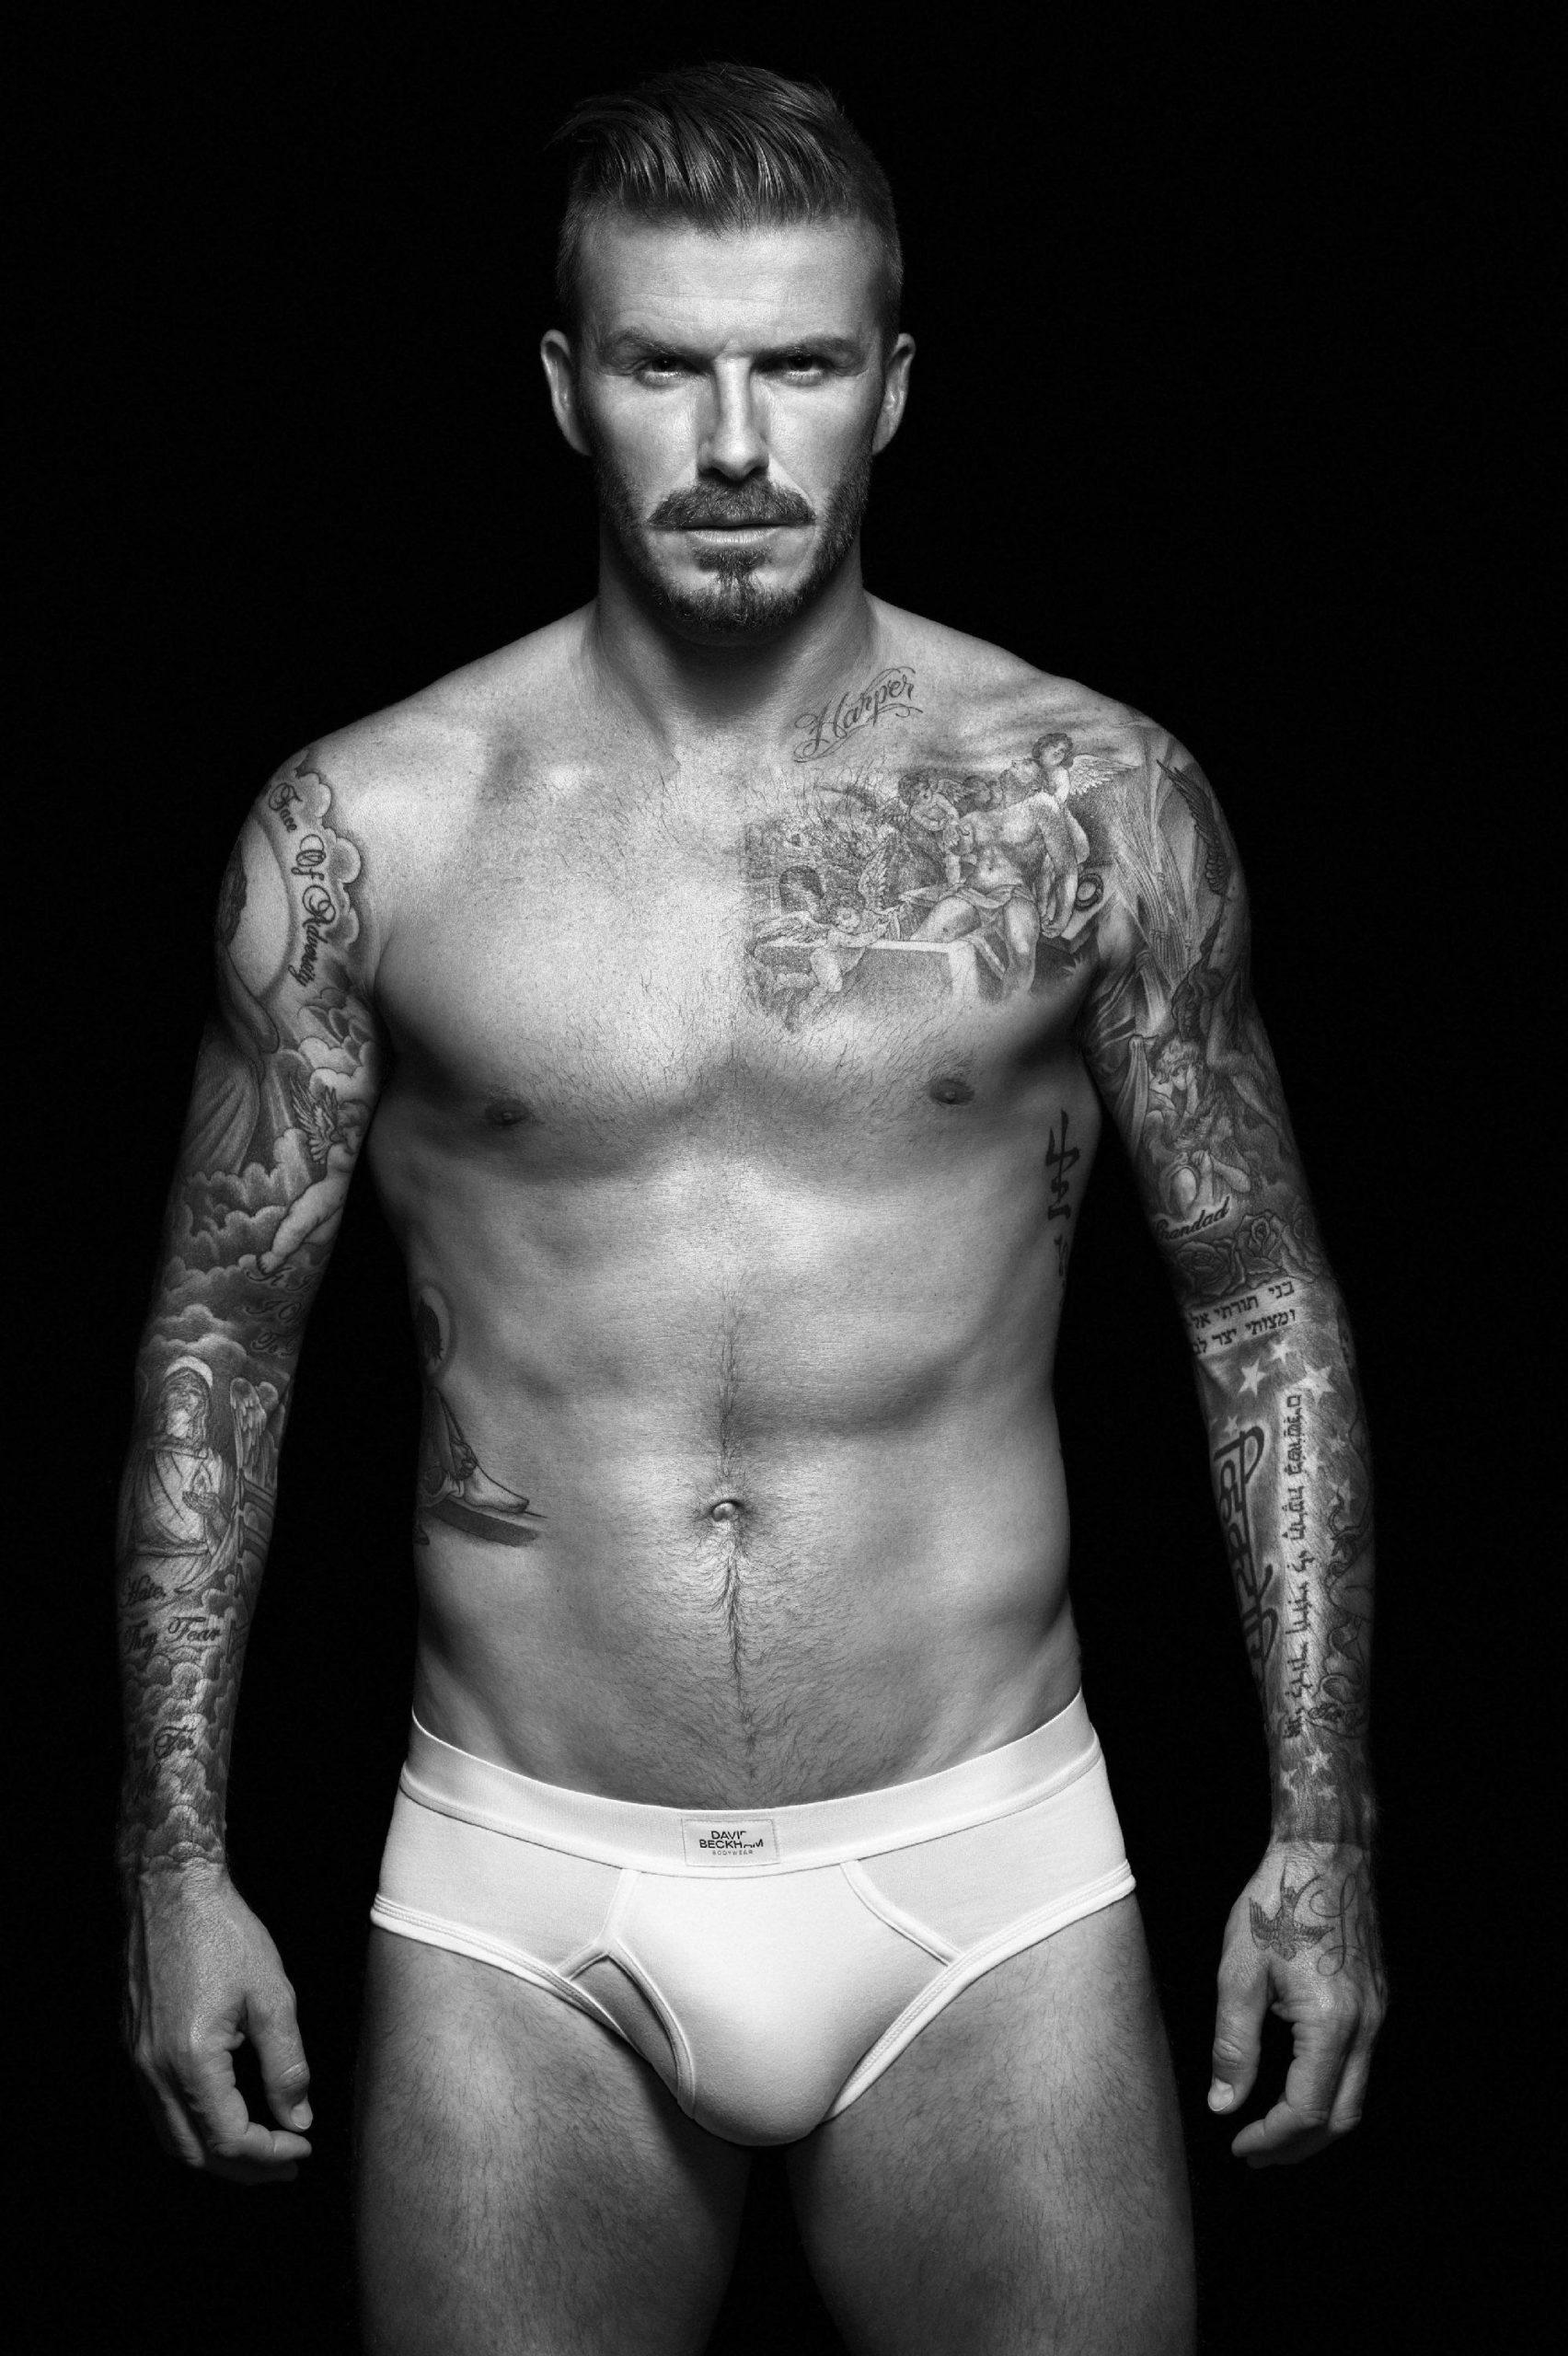 Дэвид Бекхэм, 2013. Фото: David Beckham Bodywear for H&M